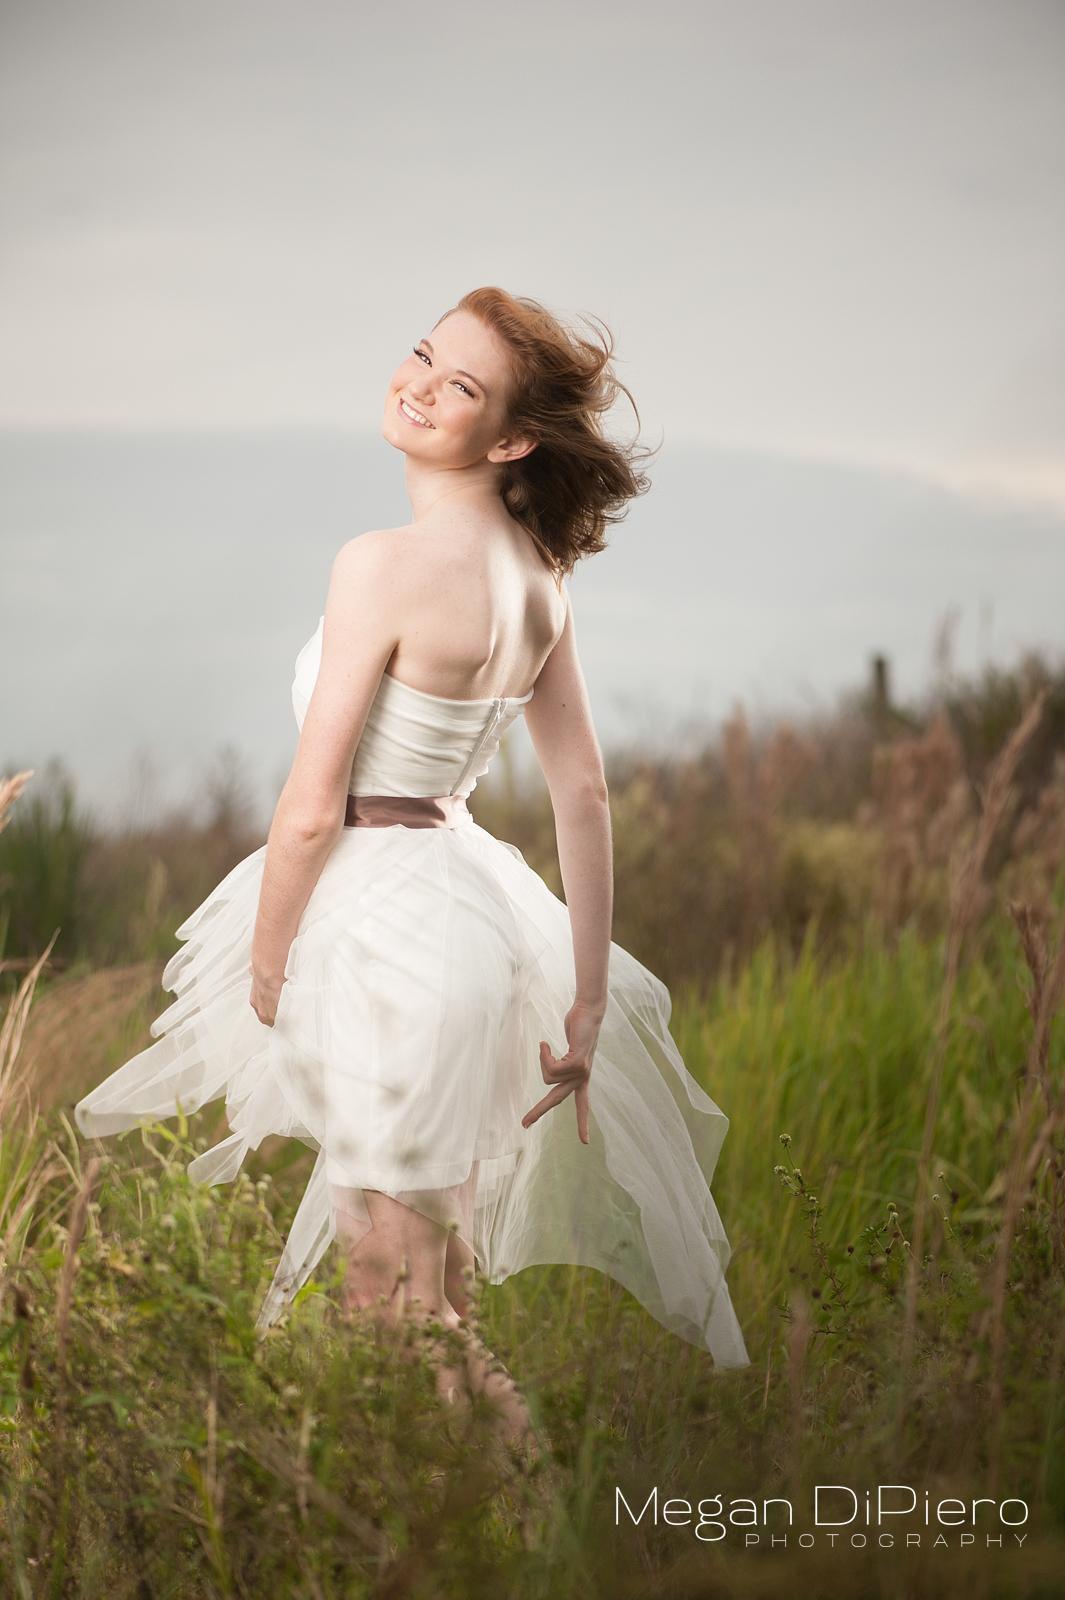 Megan DiPiero Photography {Senior Portraits With Flair}